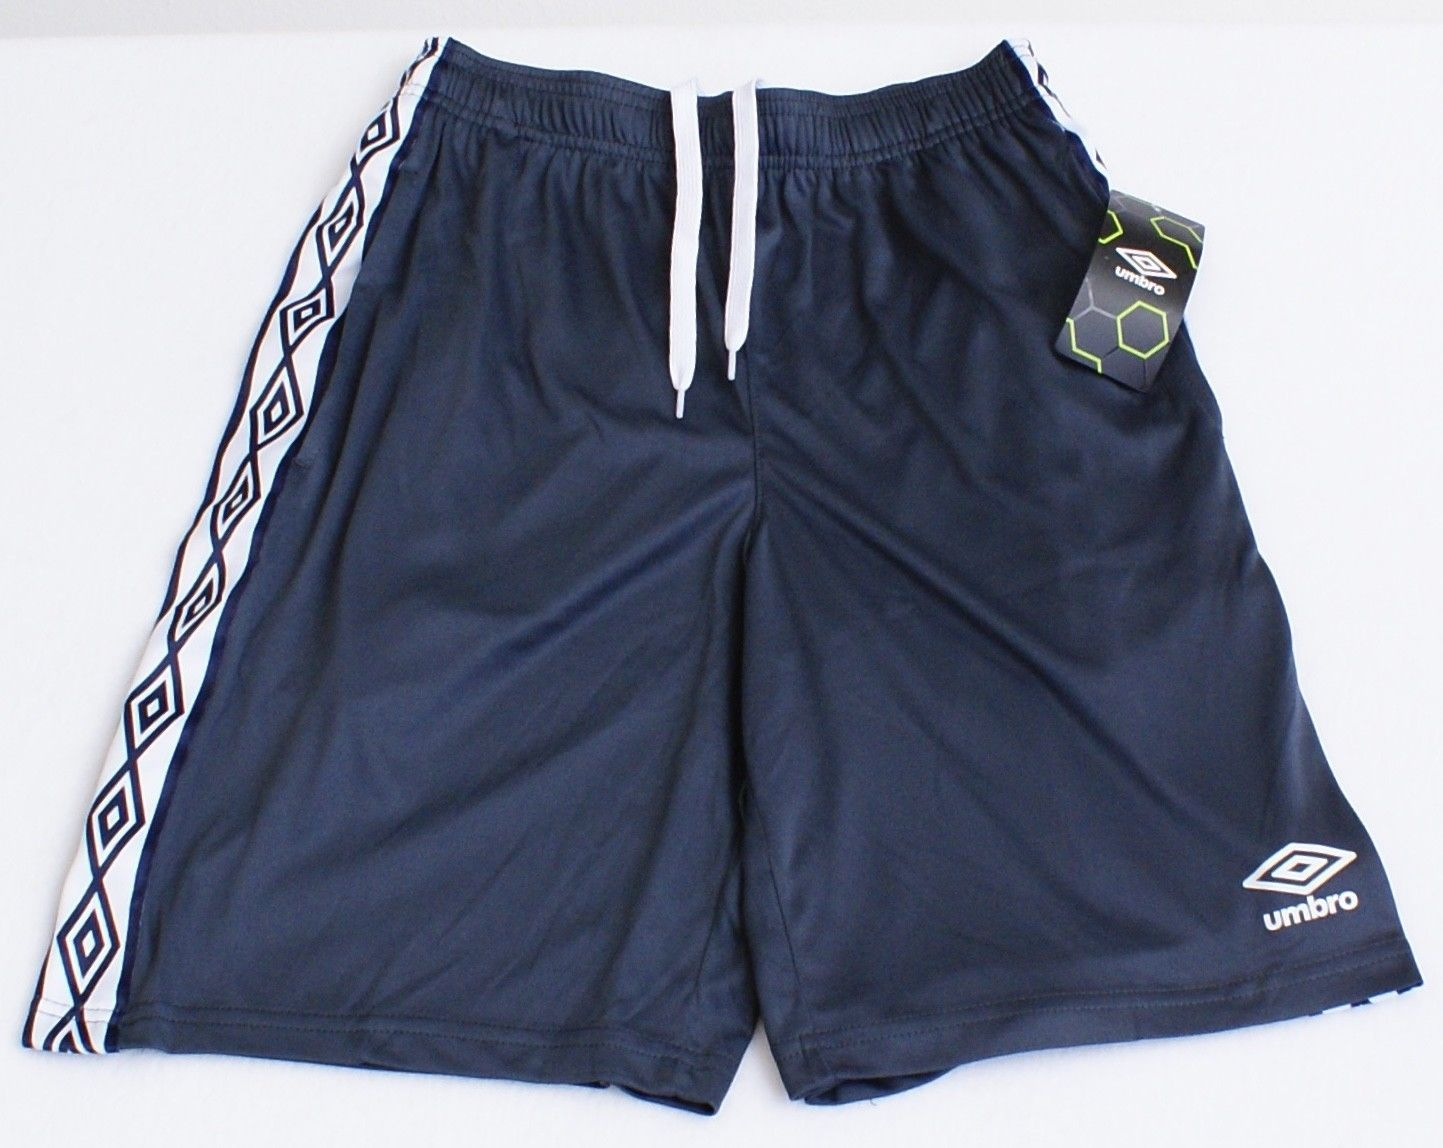 bf66f0794d Umbro Signature Gray Athletic Shorts Men's NWT - $22.49